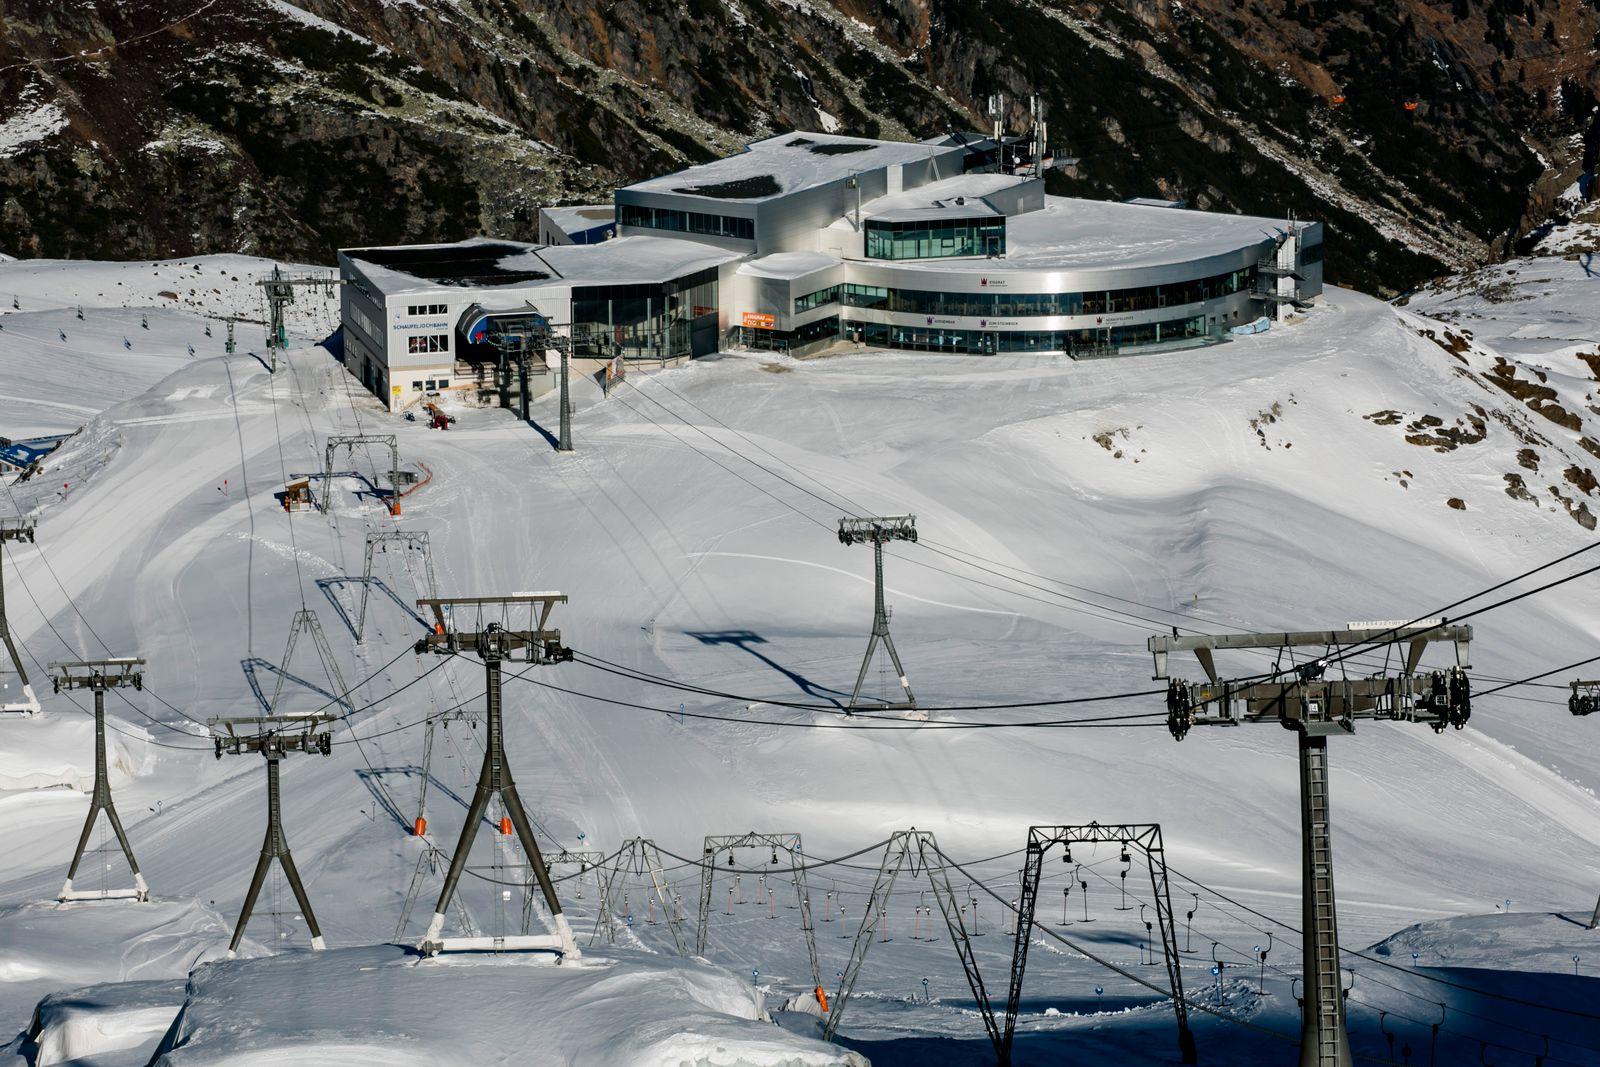 Austrian Ski Resorts To Re-Open Before Christmas